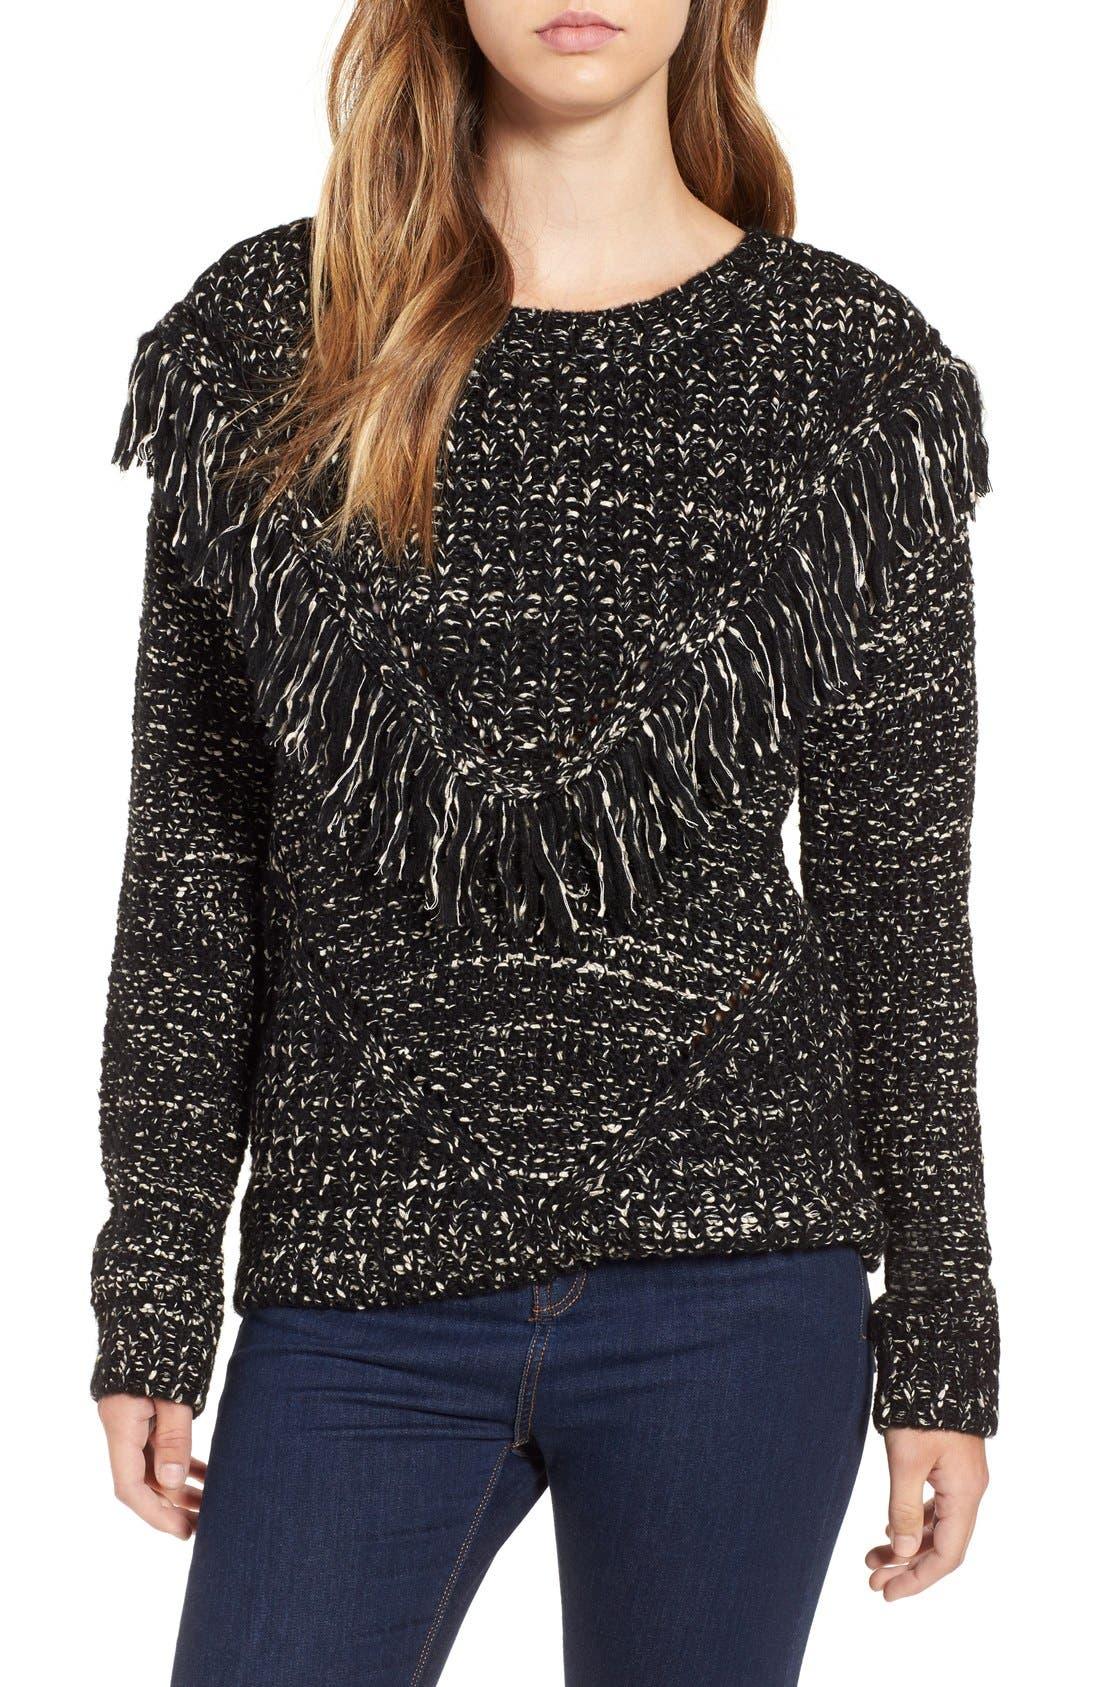 Main Image - ASTR 'Marion' Fringe Detail Crewneck Sweater